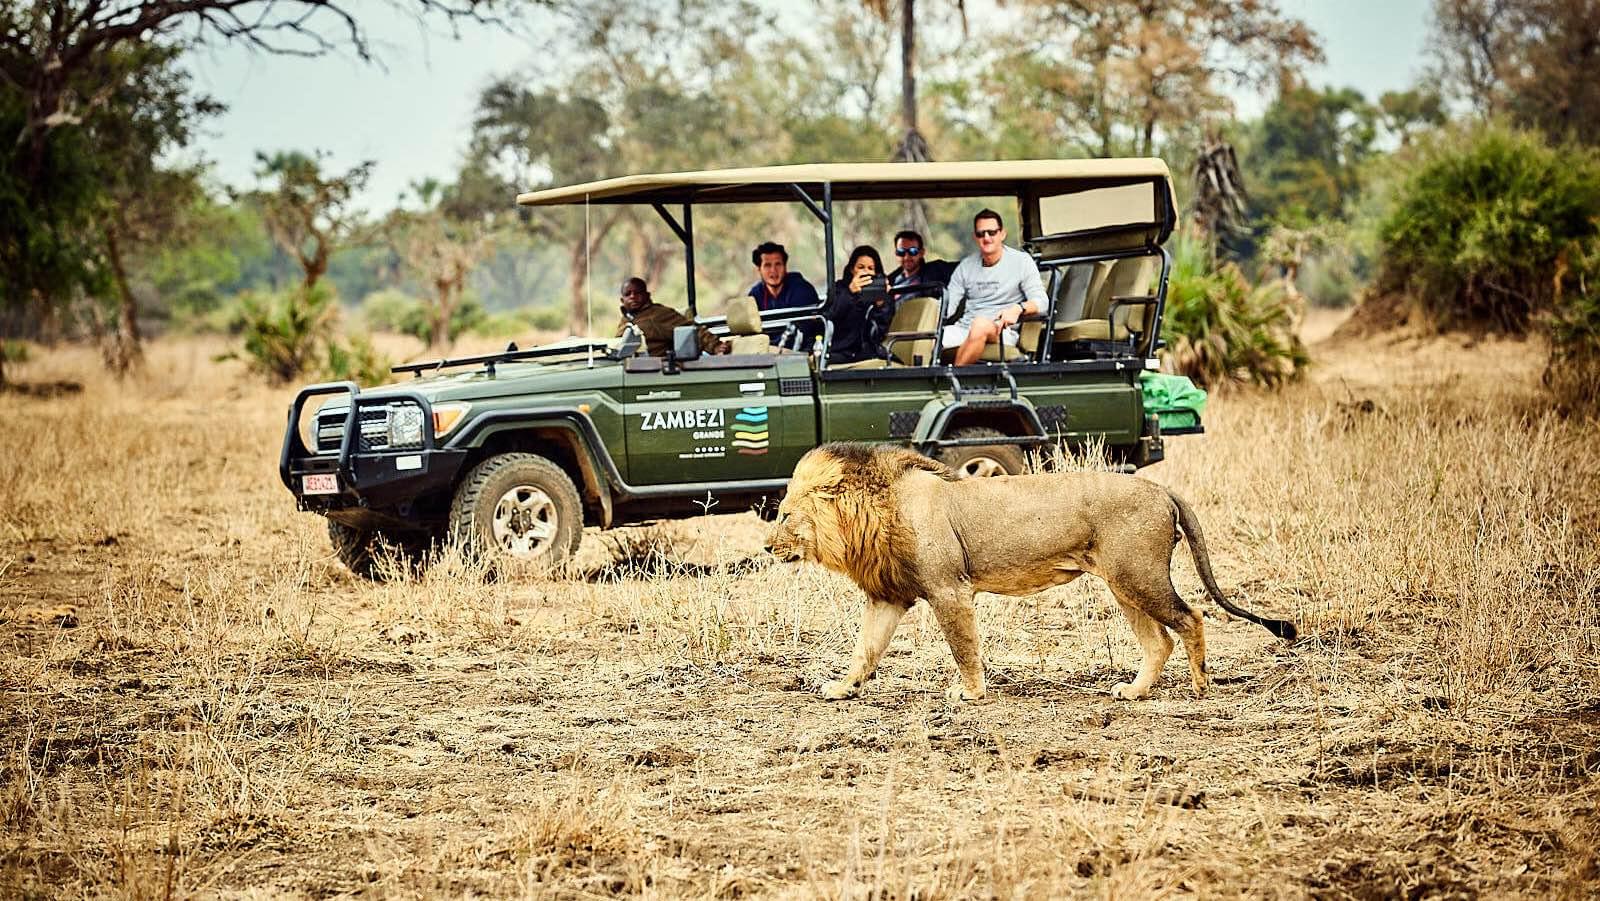 Impressions de voyage de Francis & ses amis, Fly-in Botswana, Zimbabwe – Septembre 2019